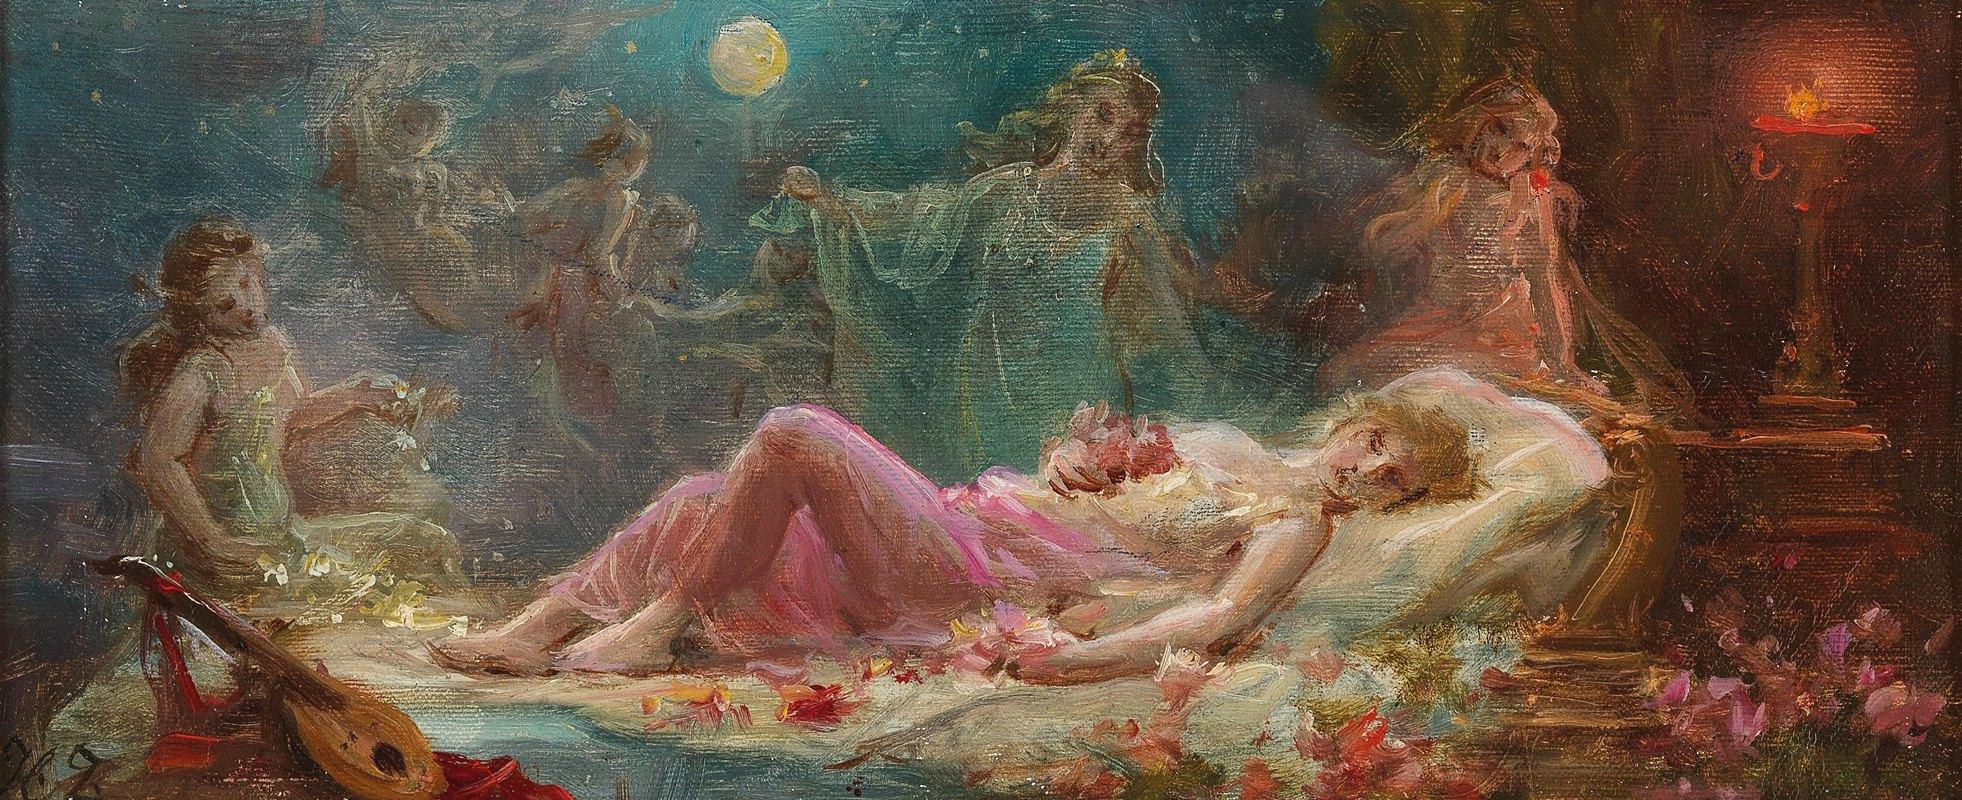 Hans Zatzka - Allegory of Sleep